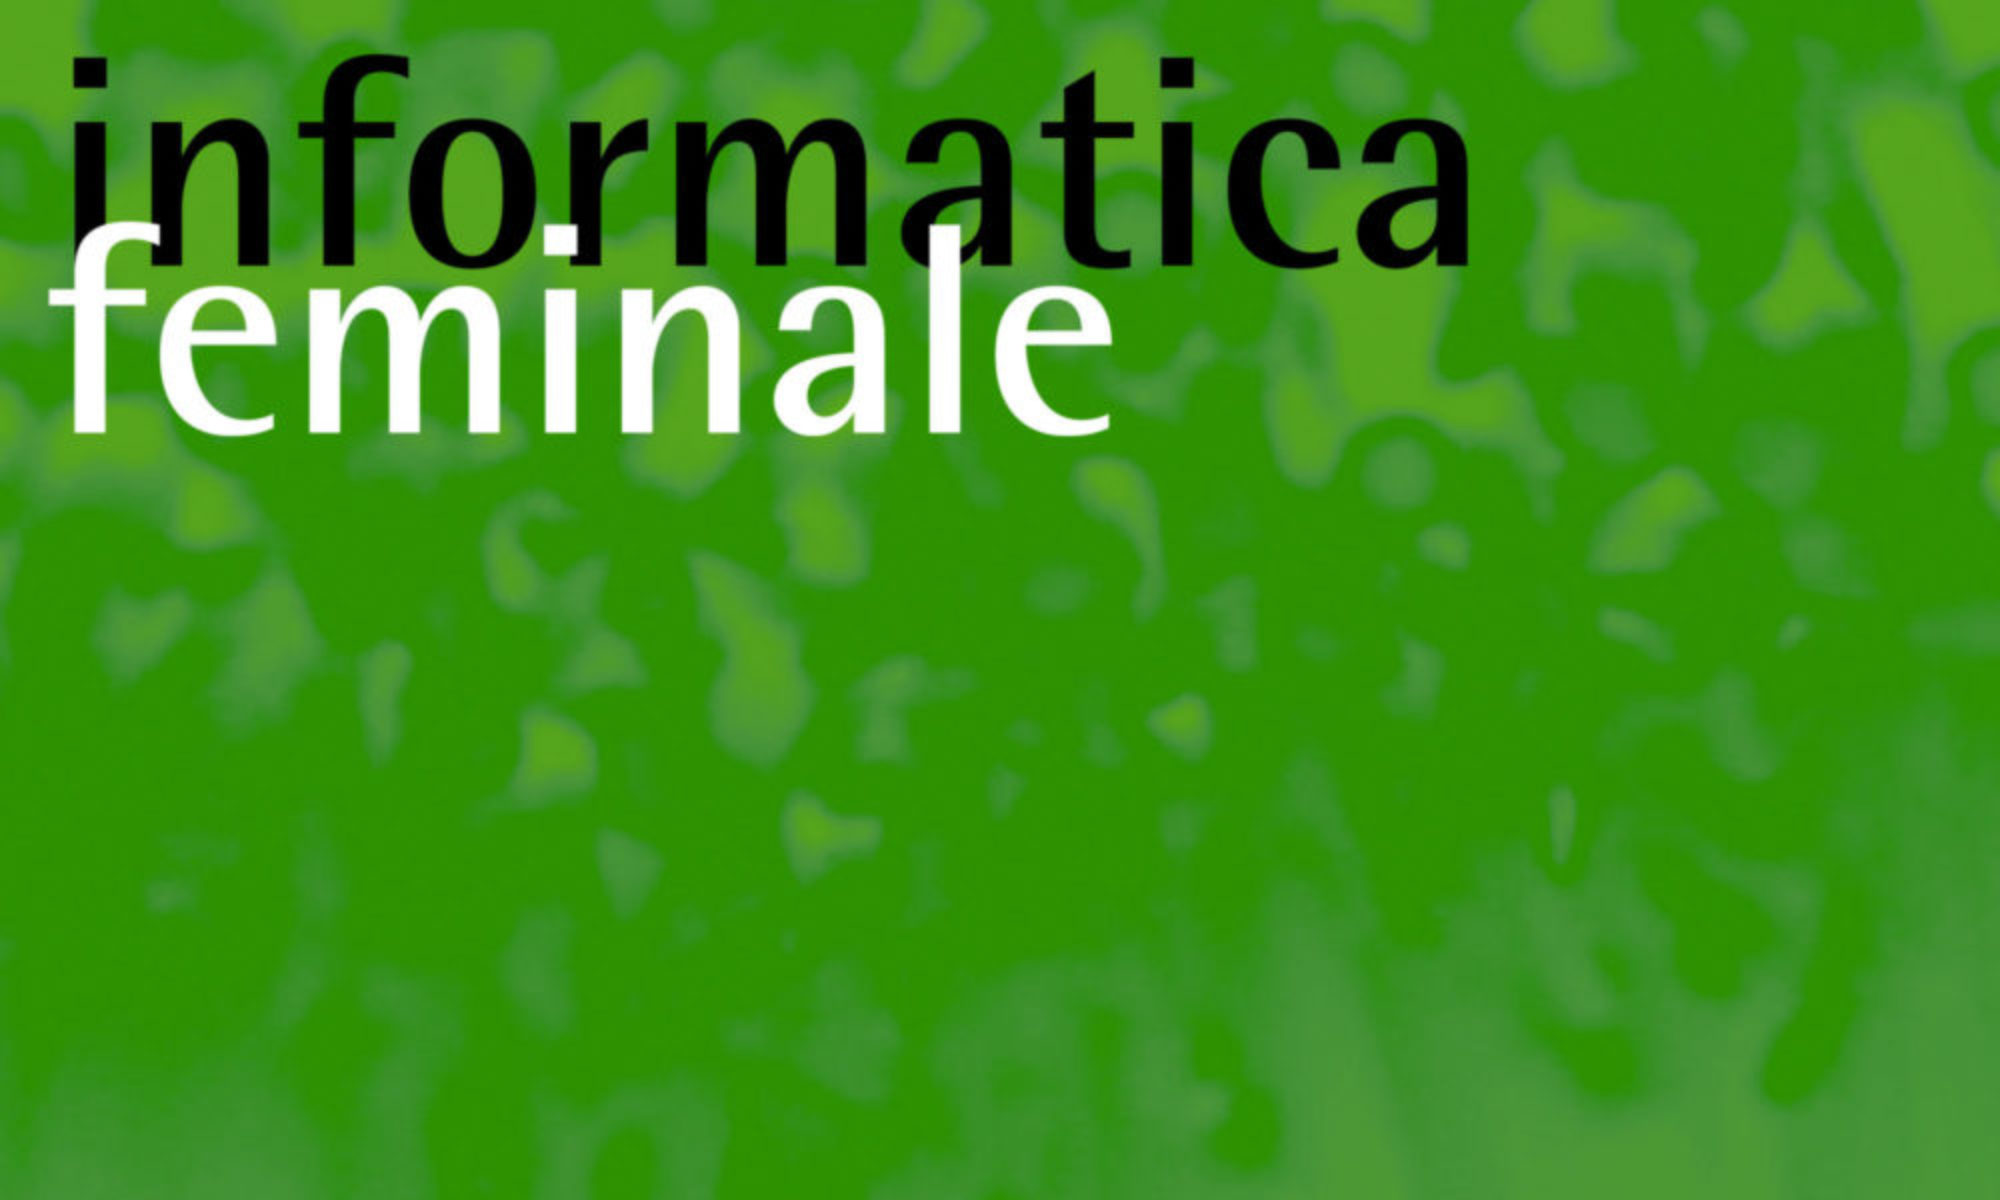 20. Informatica Feminale